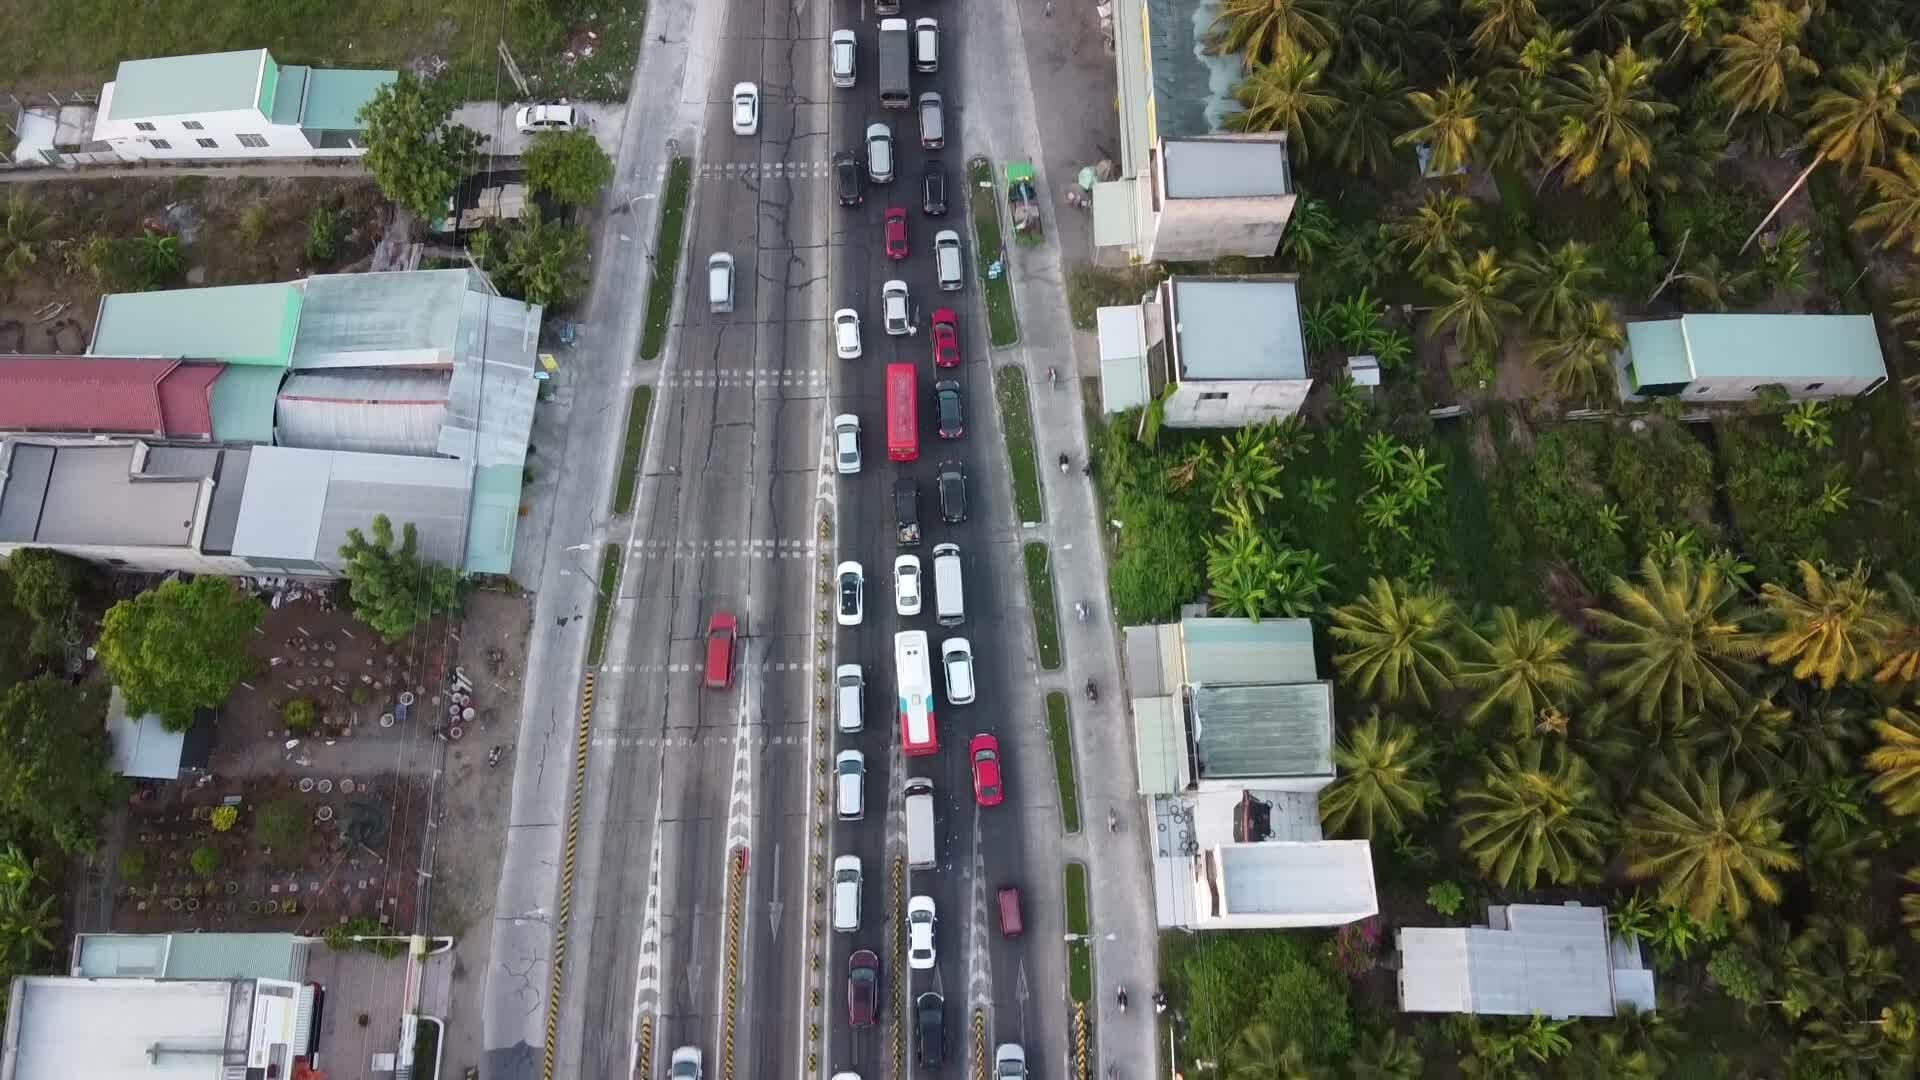 Kẹt xe gần 10 km hai bên cầu Rạch Miễu